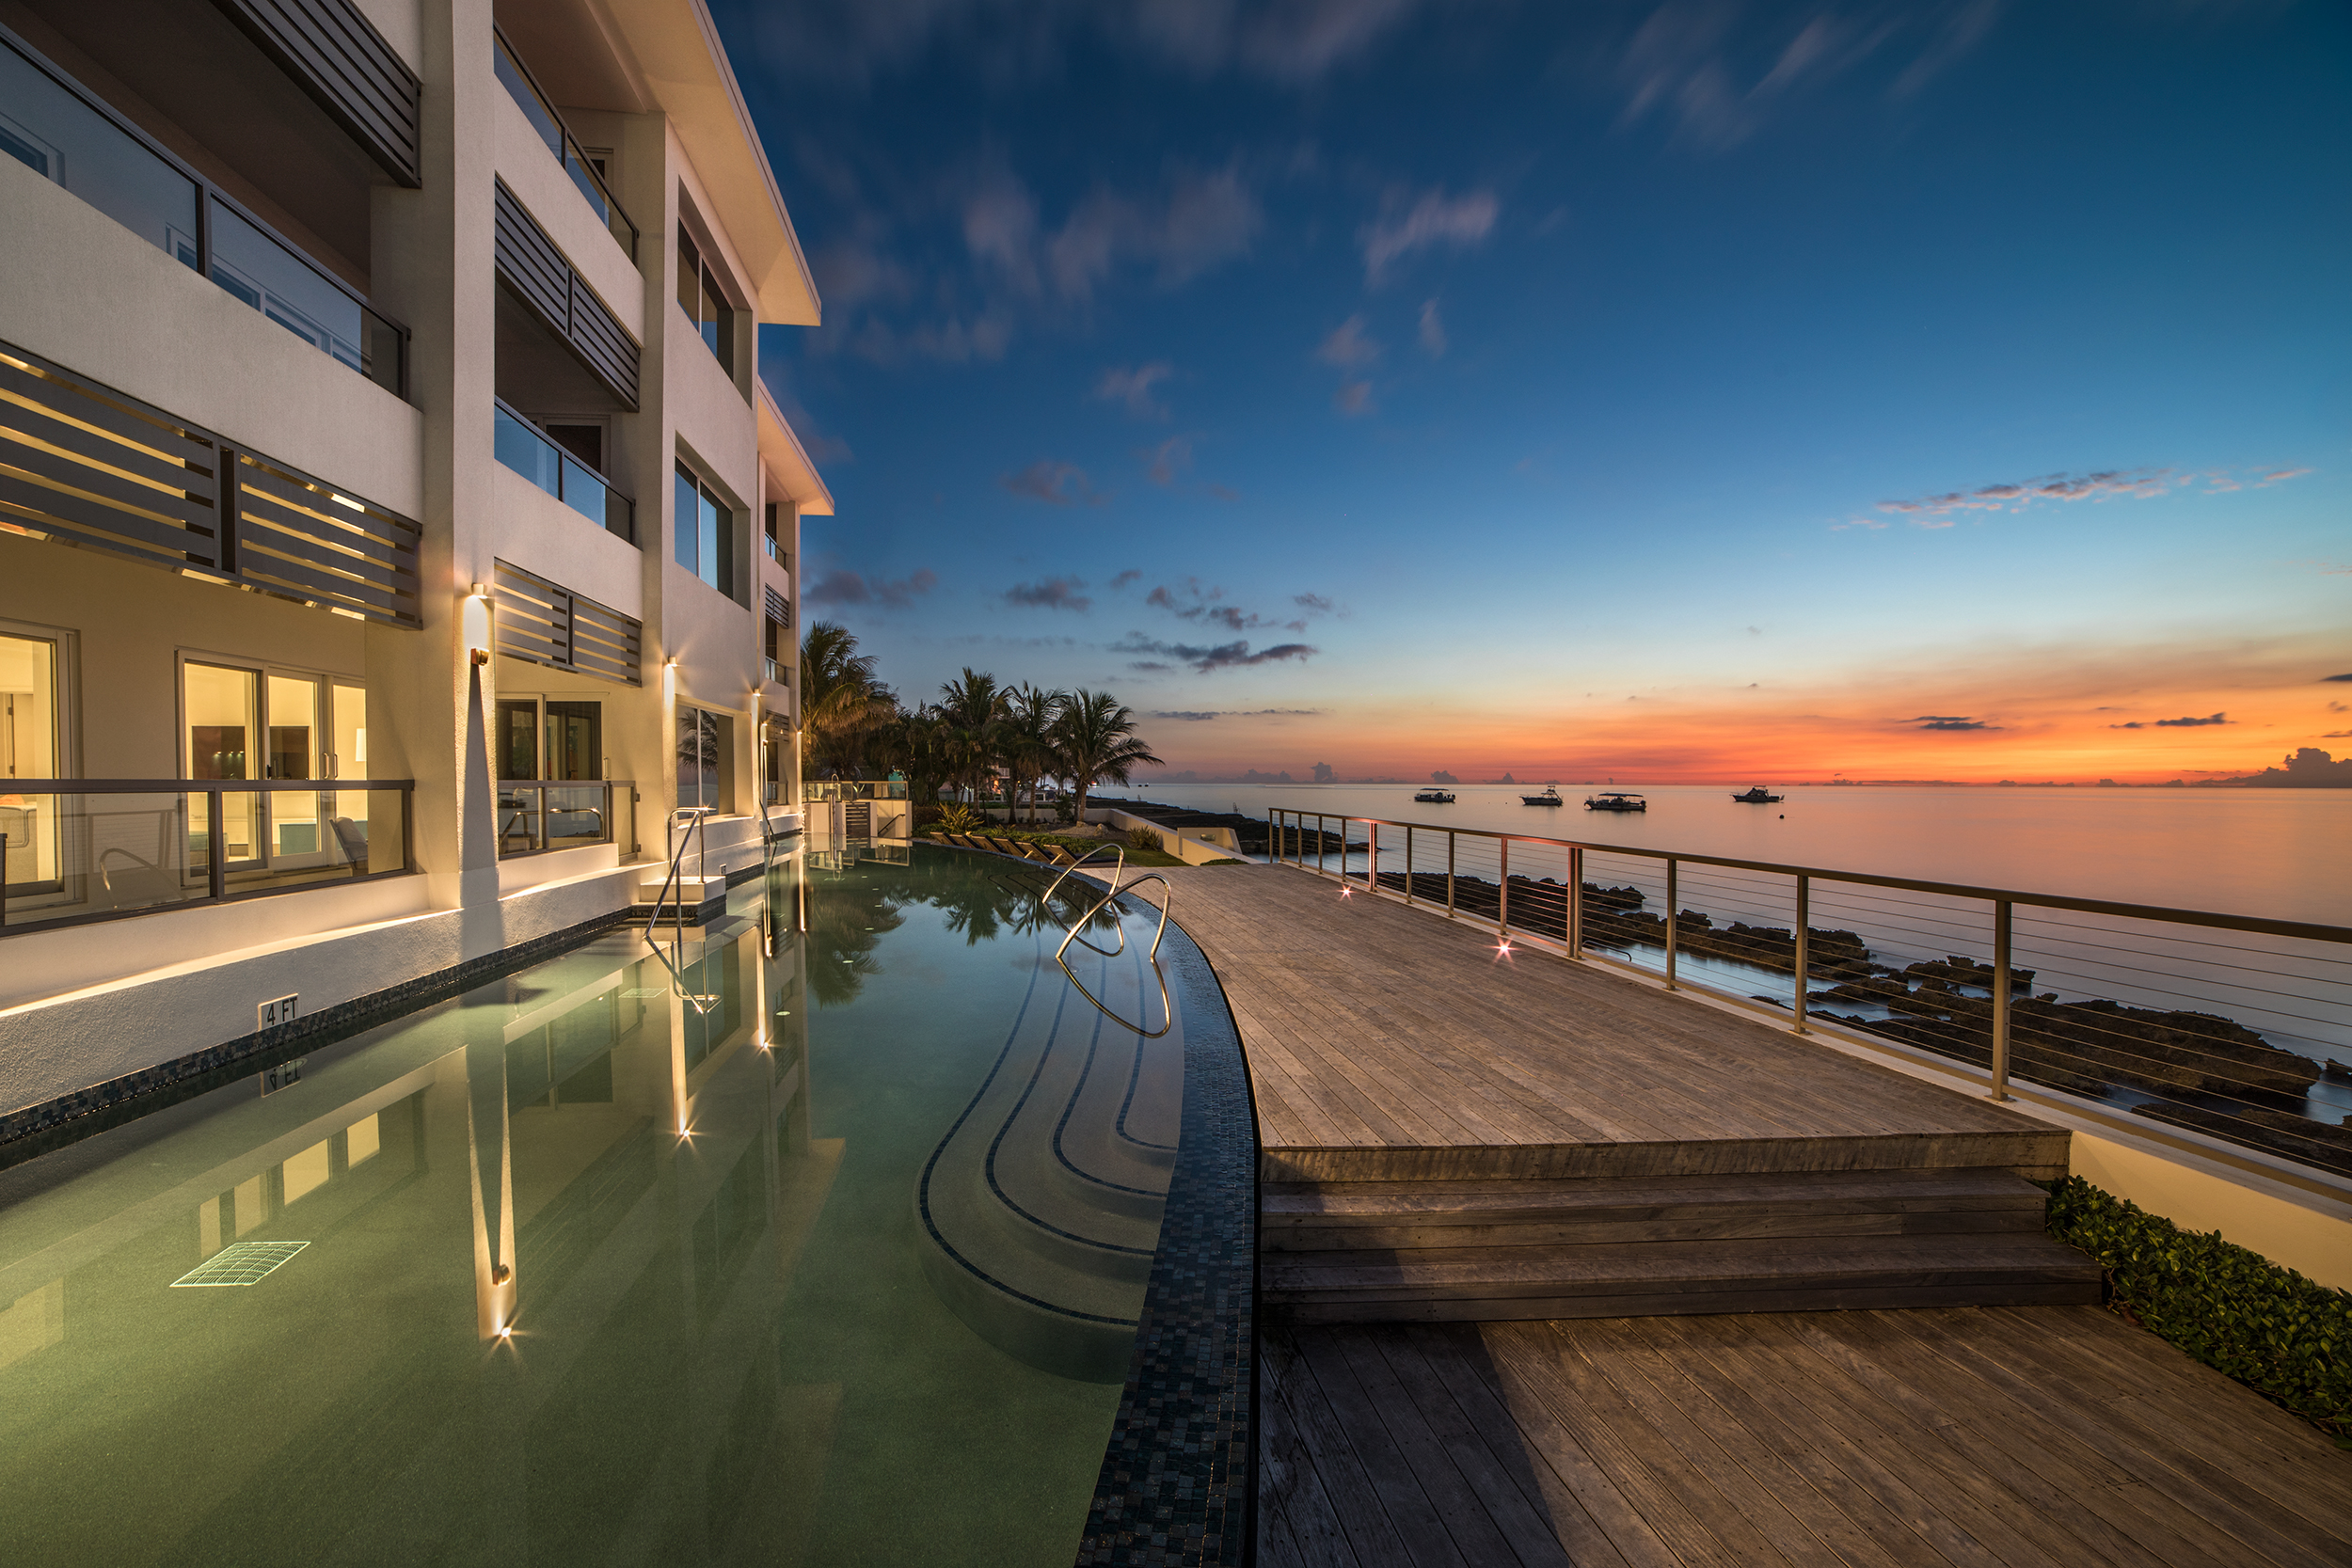 Bronte-Cayman-Islands-Oceana_026.jpg